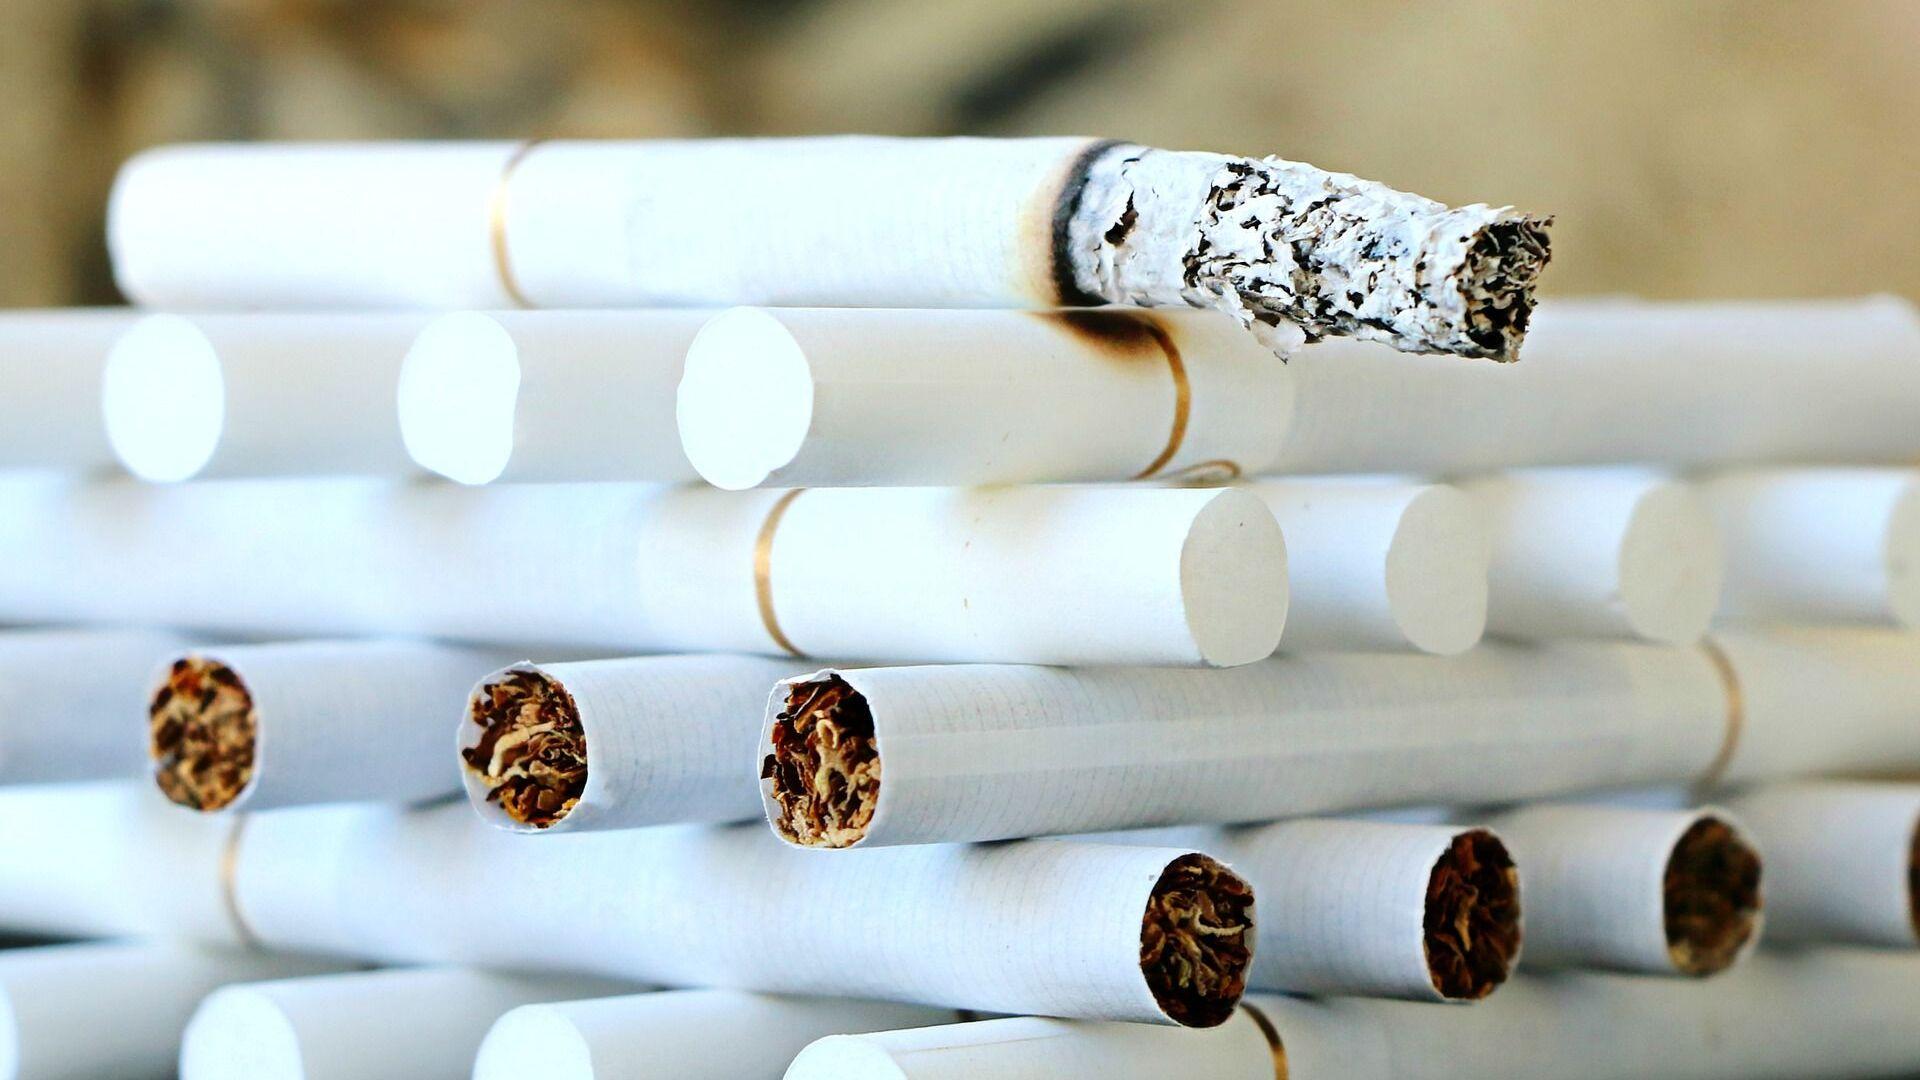 Cigarrillos  - Sputnik Mundo, 1920, 21.11.2019